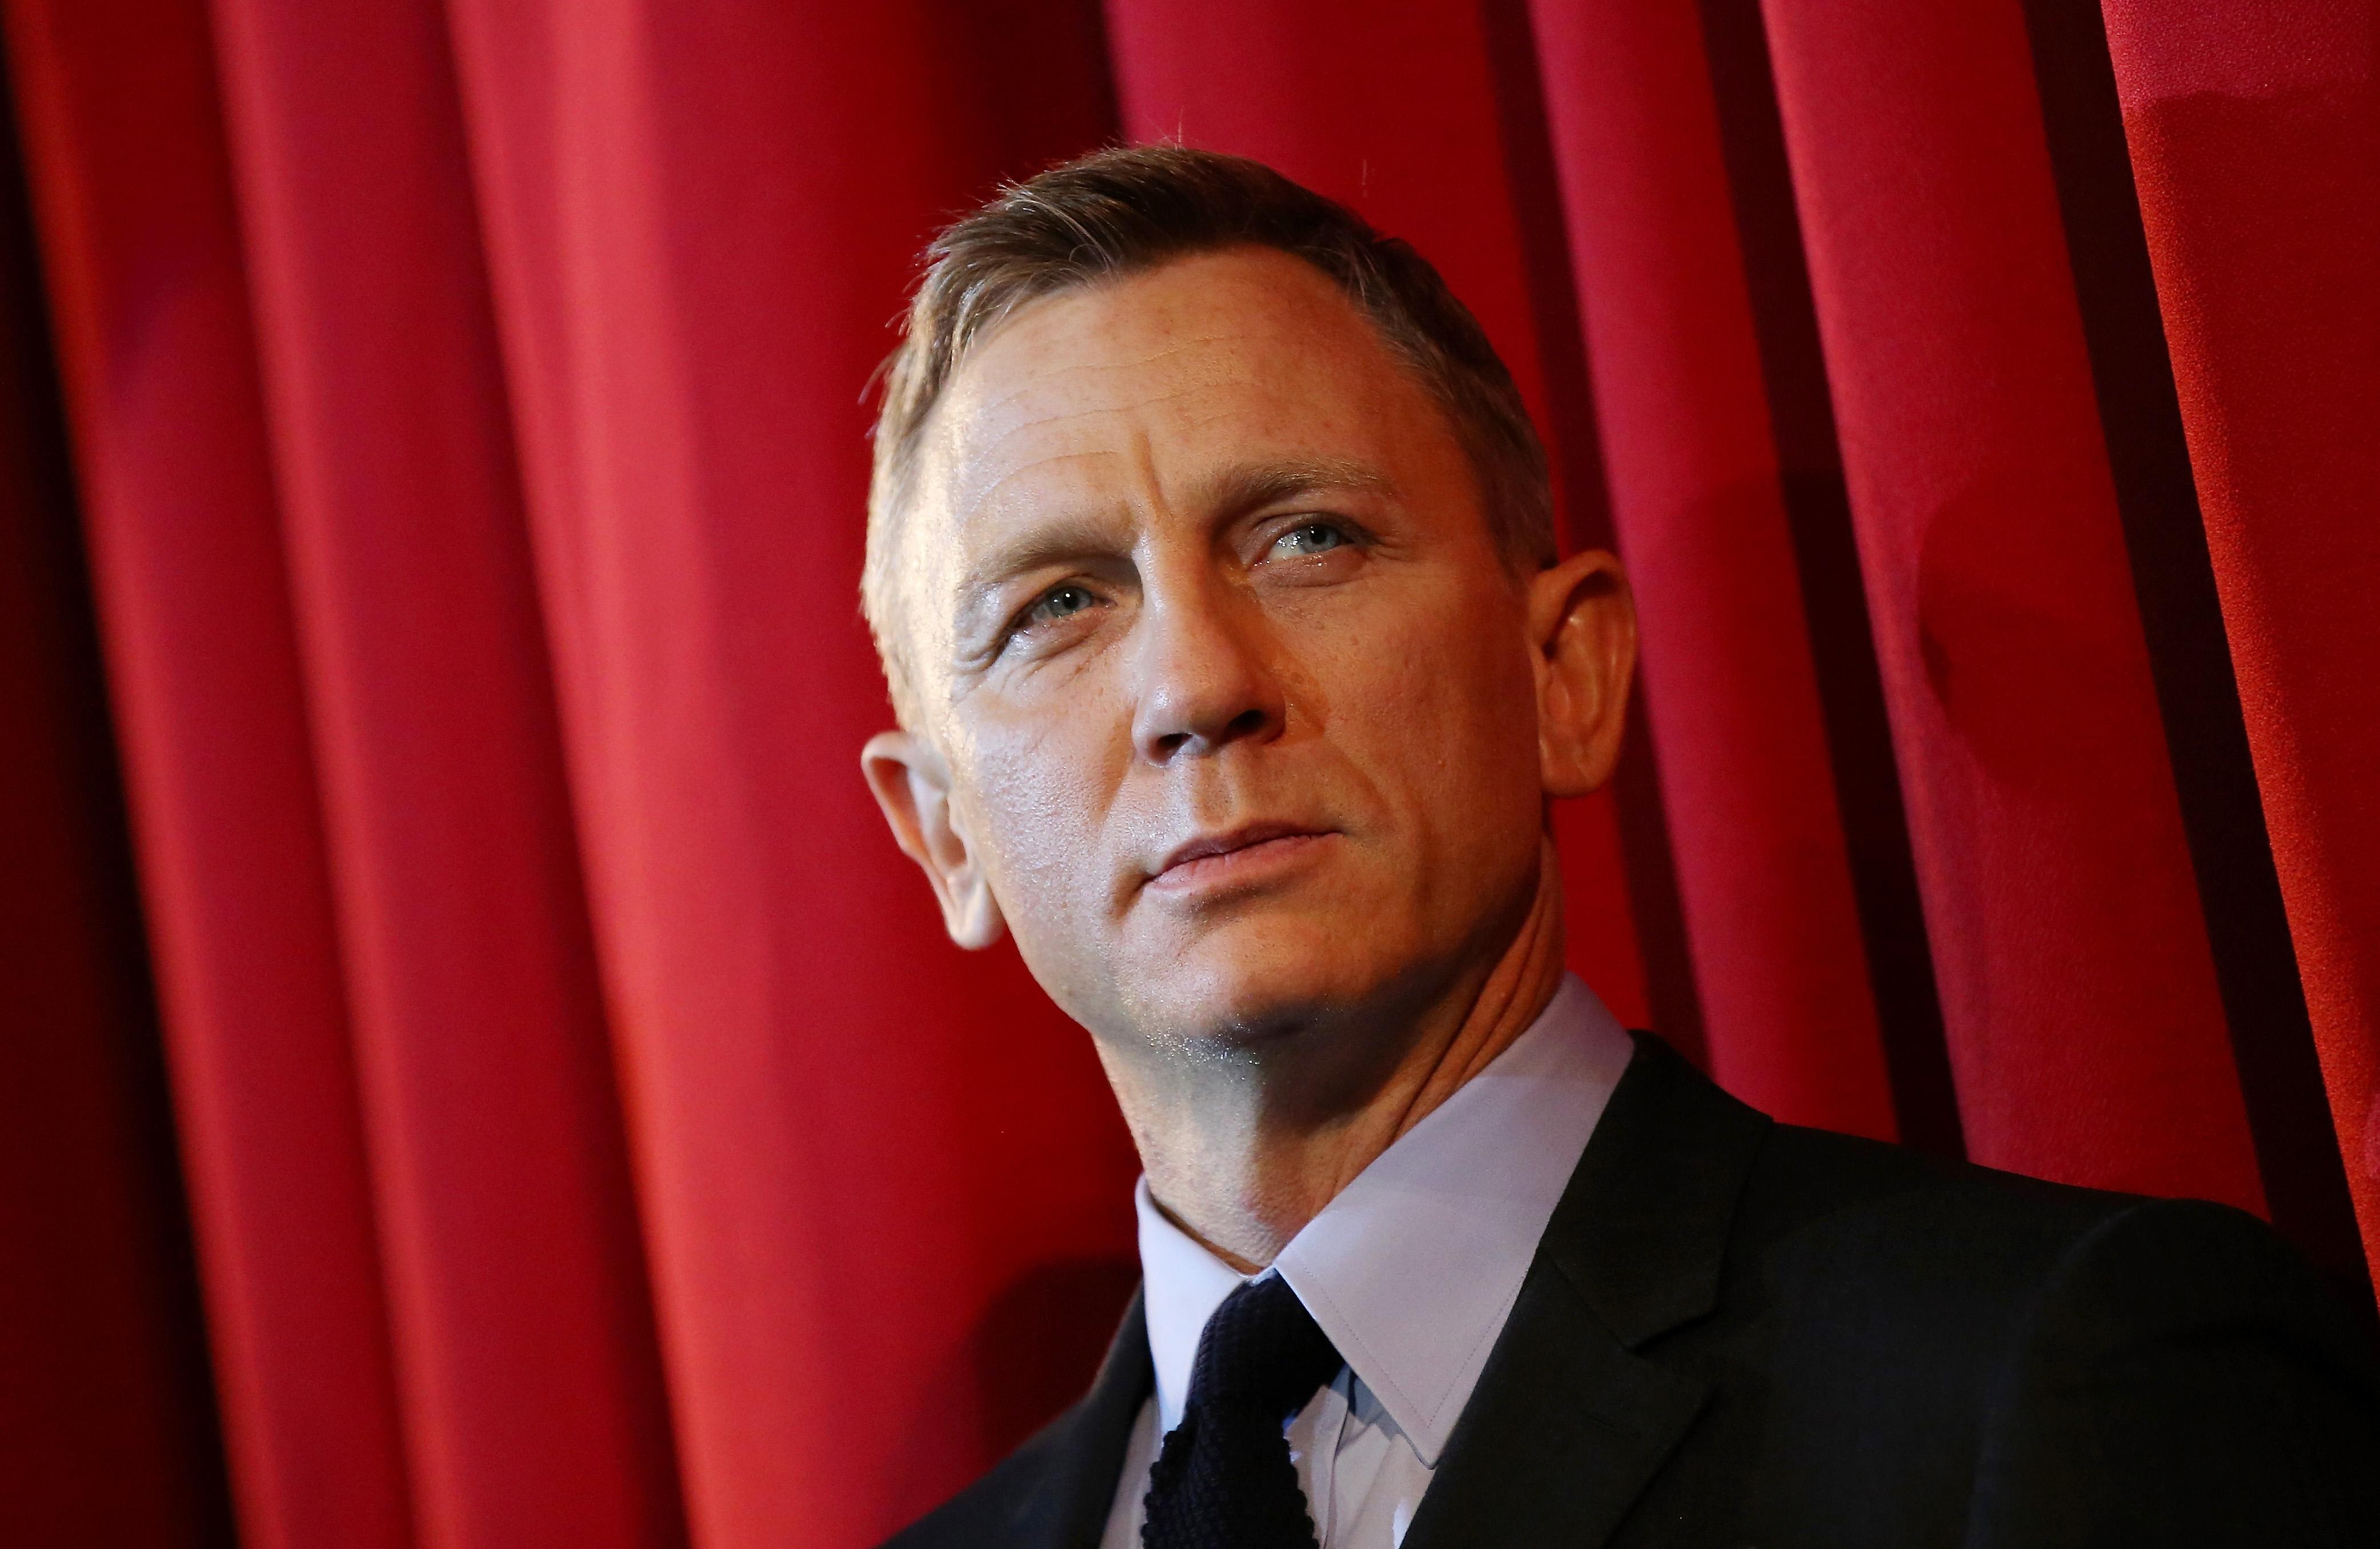 Daniel Craig suffers injury on the 'James Bond' set